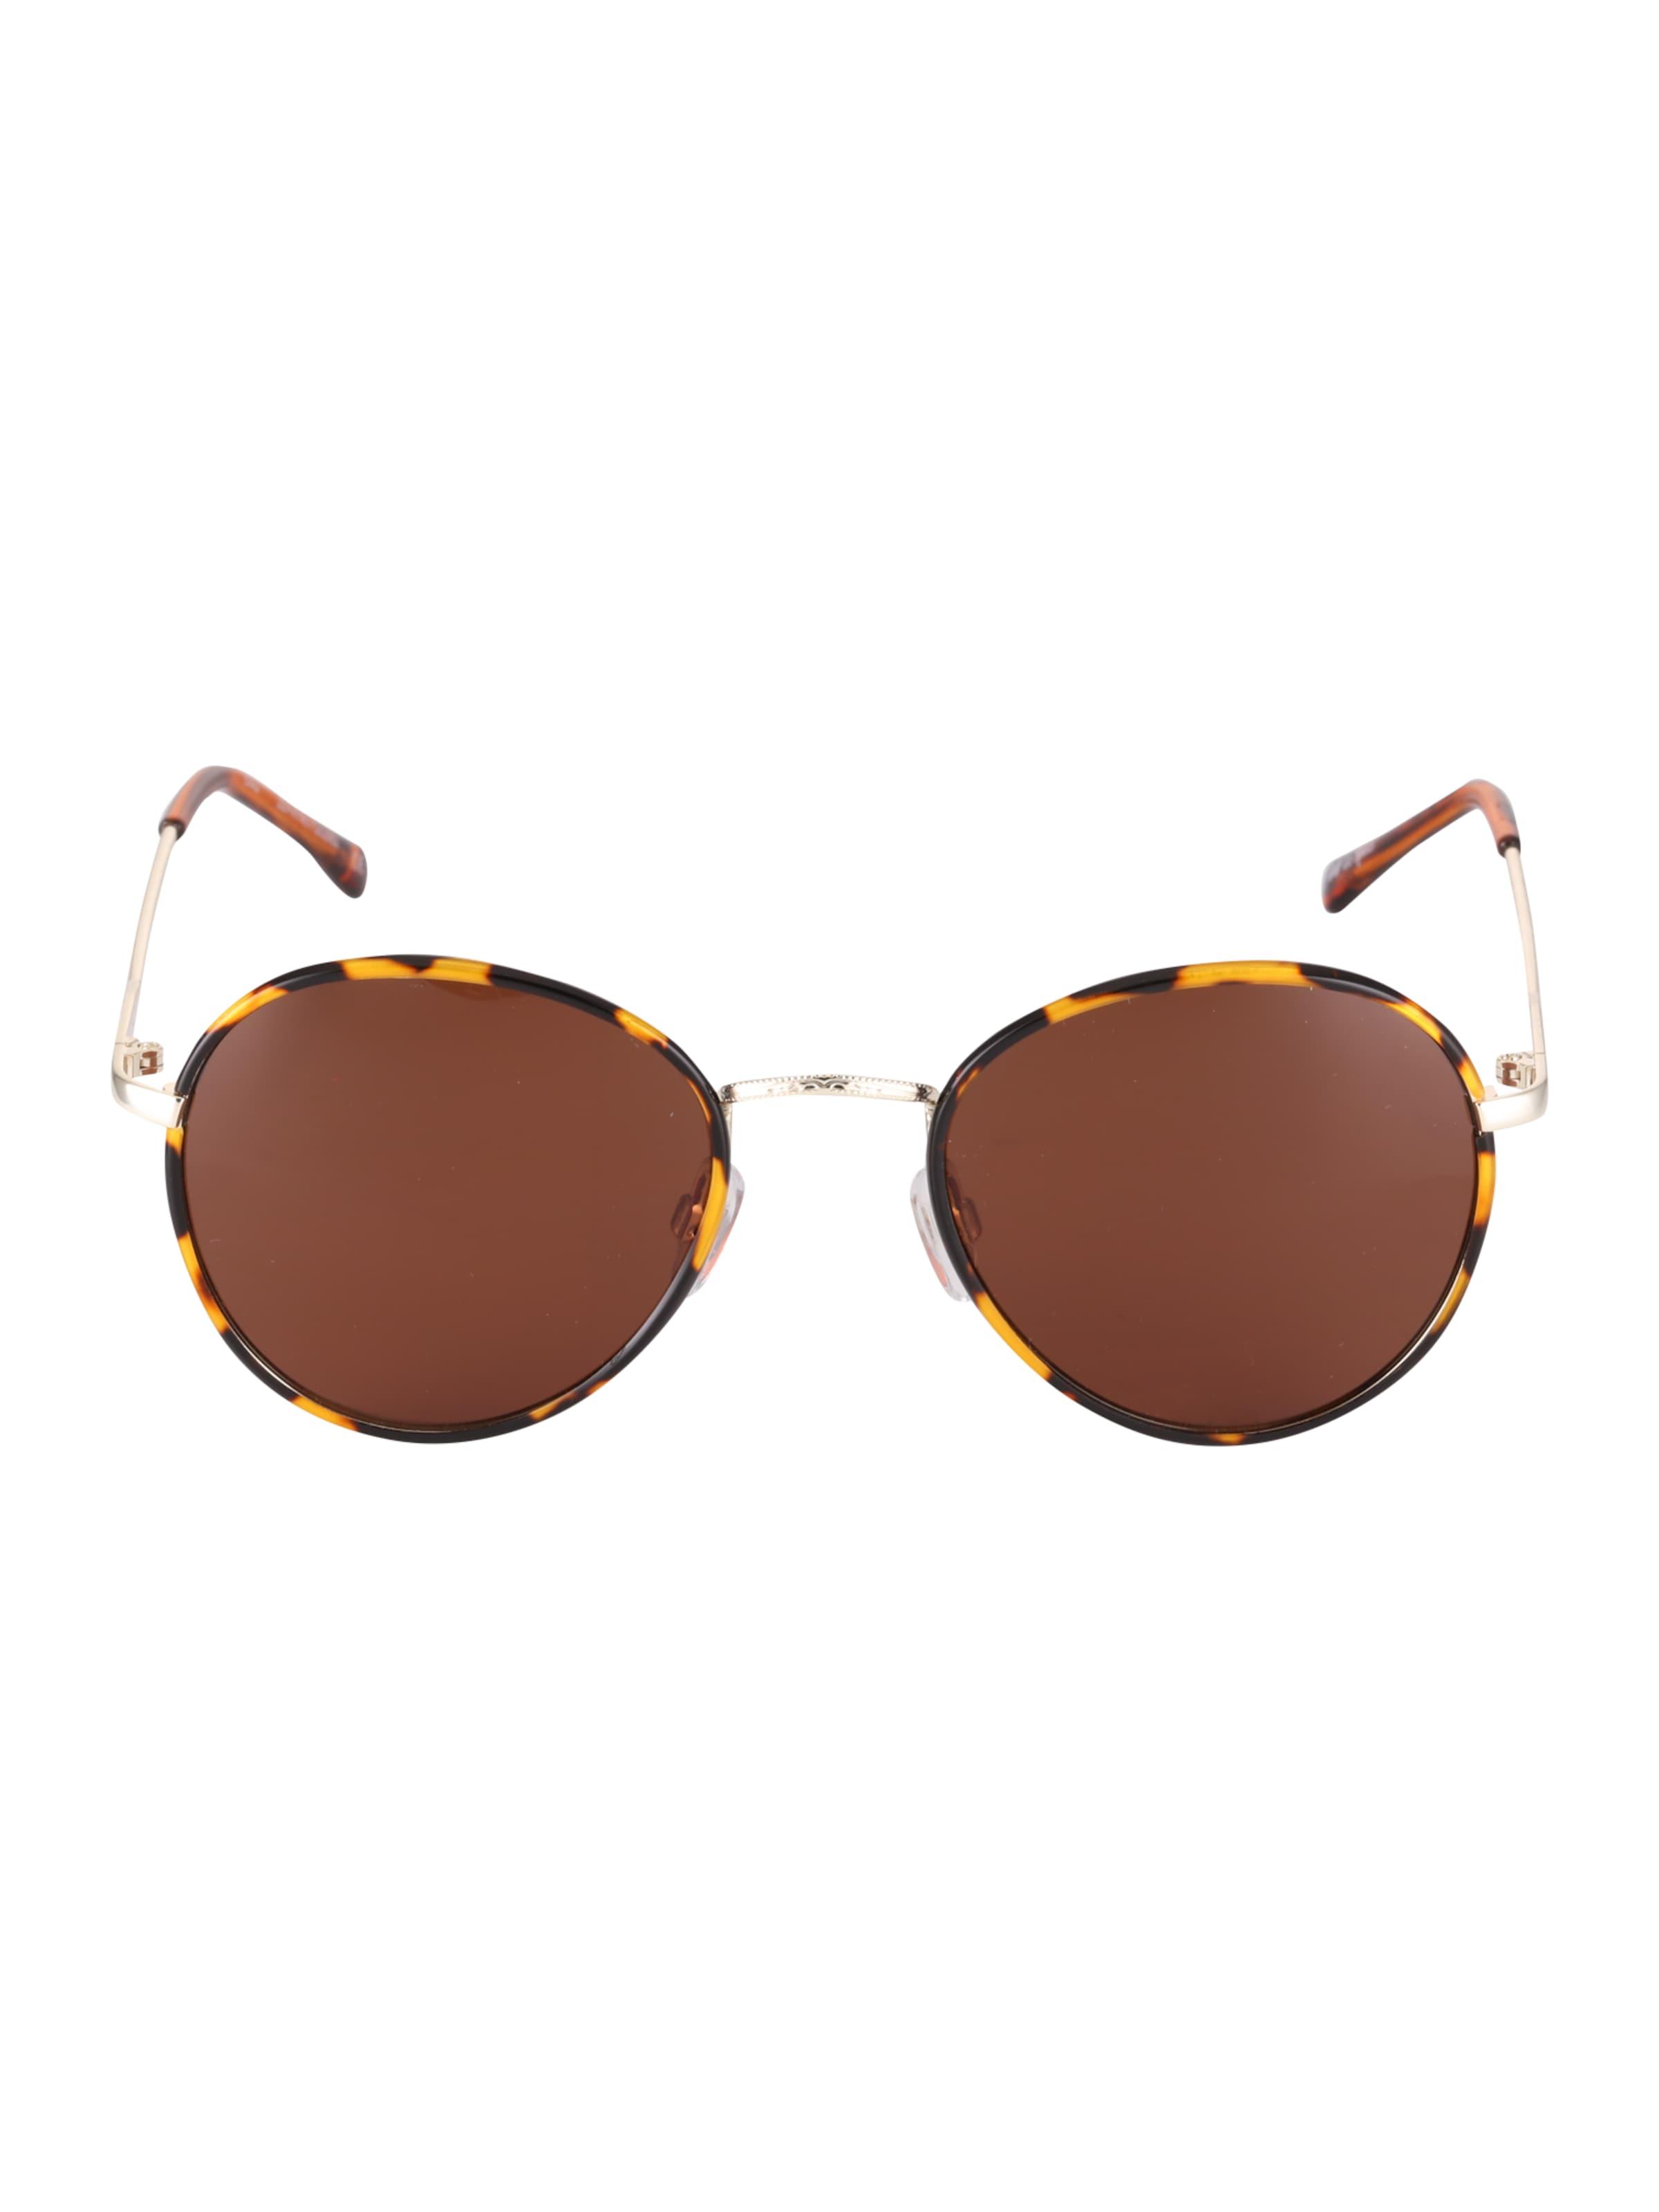 2018 Zum Verkauf Low-Cost Verkauf Online LE SPECS Sonnenbrille 'ZEPHYR' Rabatt 2018 Neue Freies Verschiffen Auslass FdiQgUW7ee